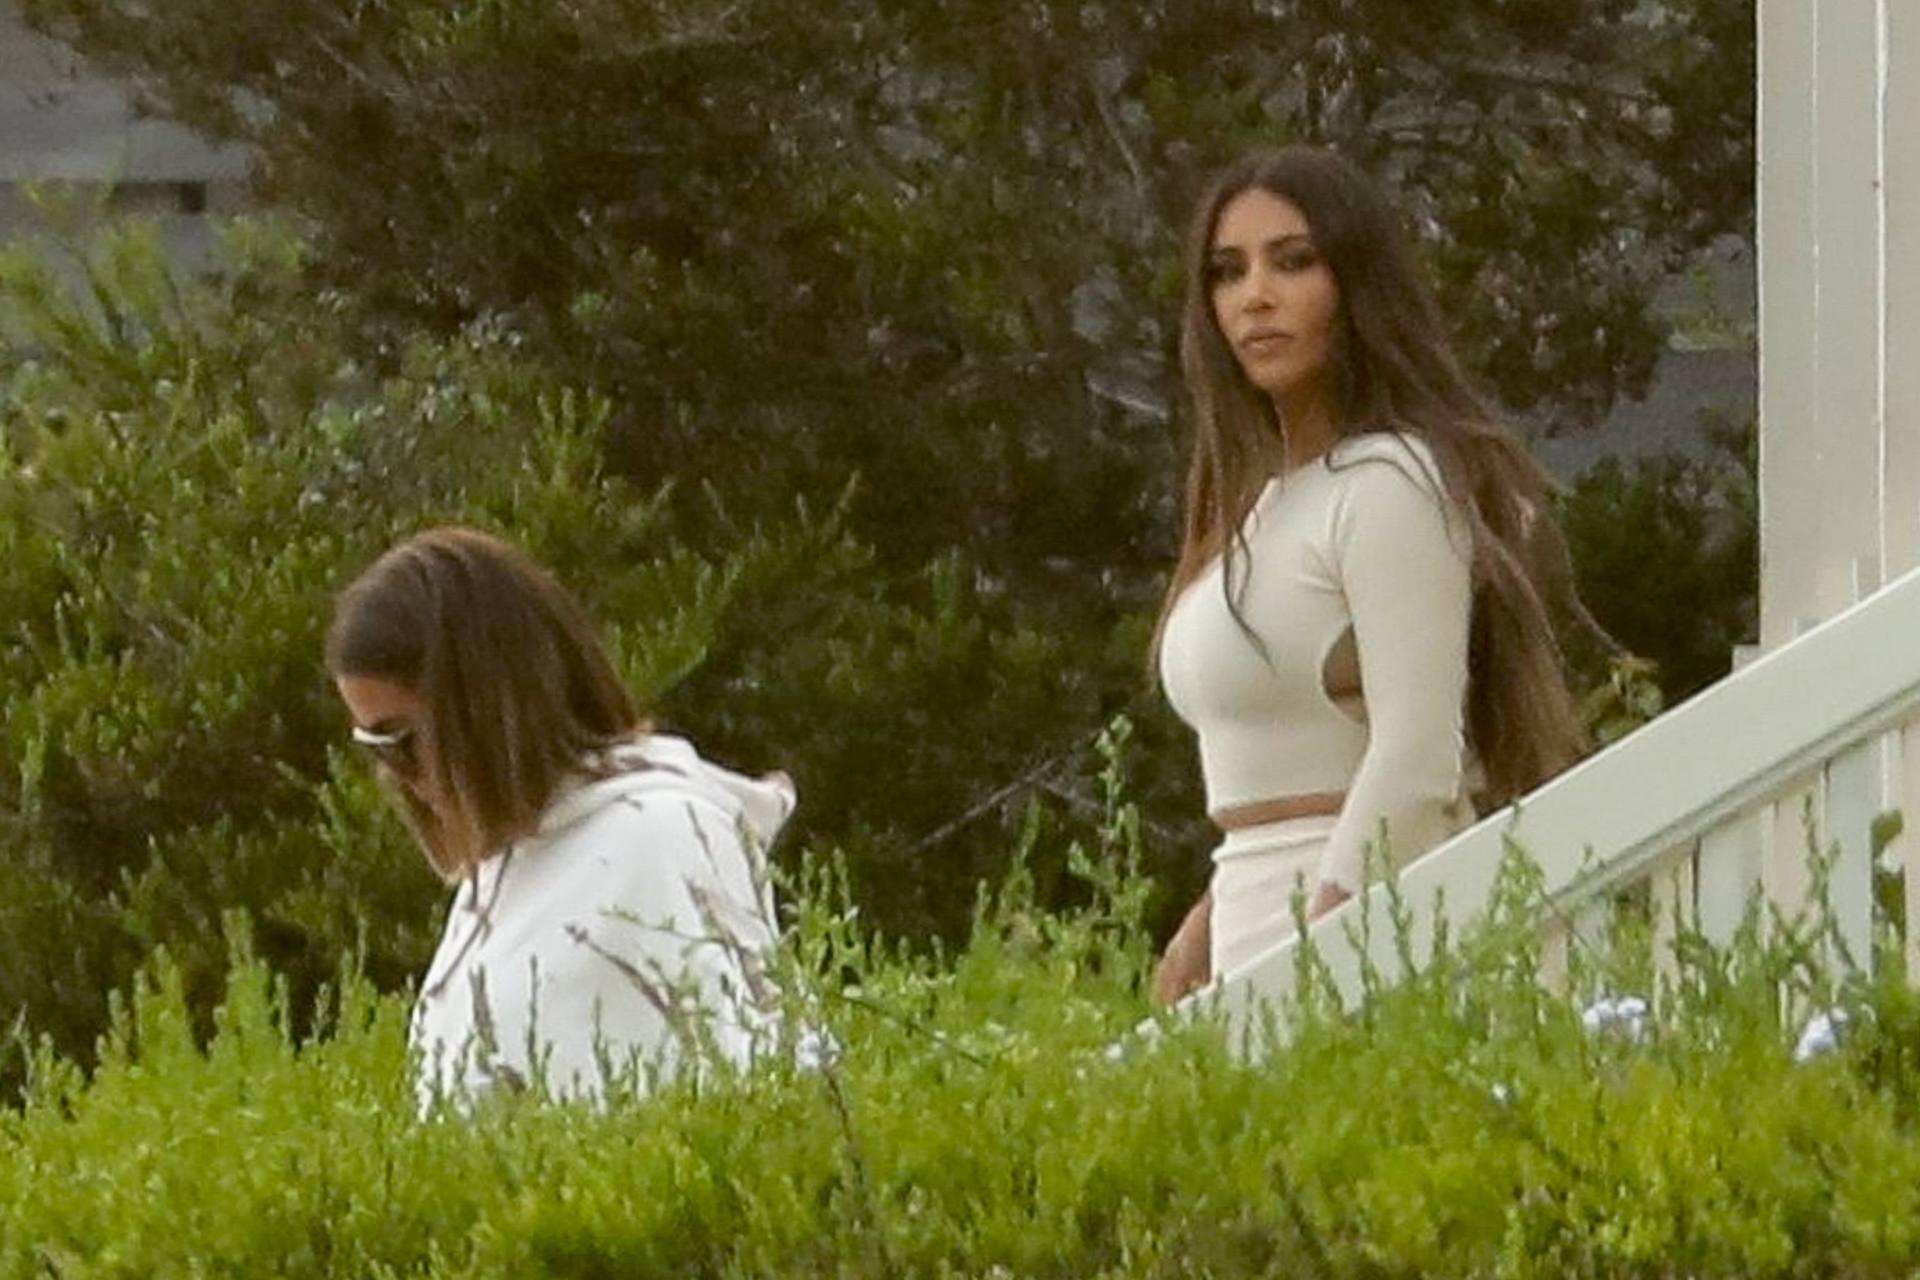 Kim Kardashian - Sexy Big Ass at the Beach on KUWTK Set in Malibu